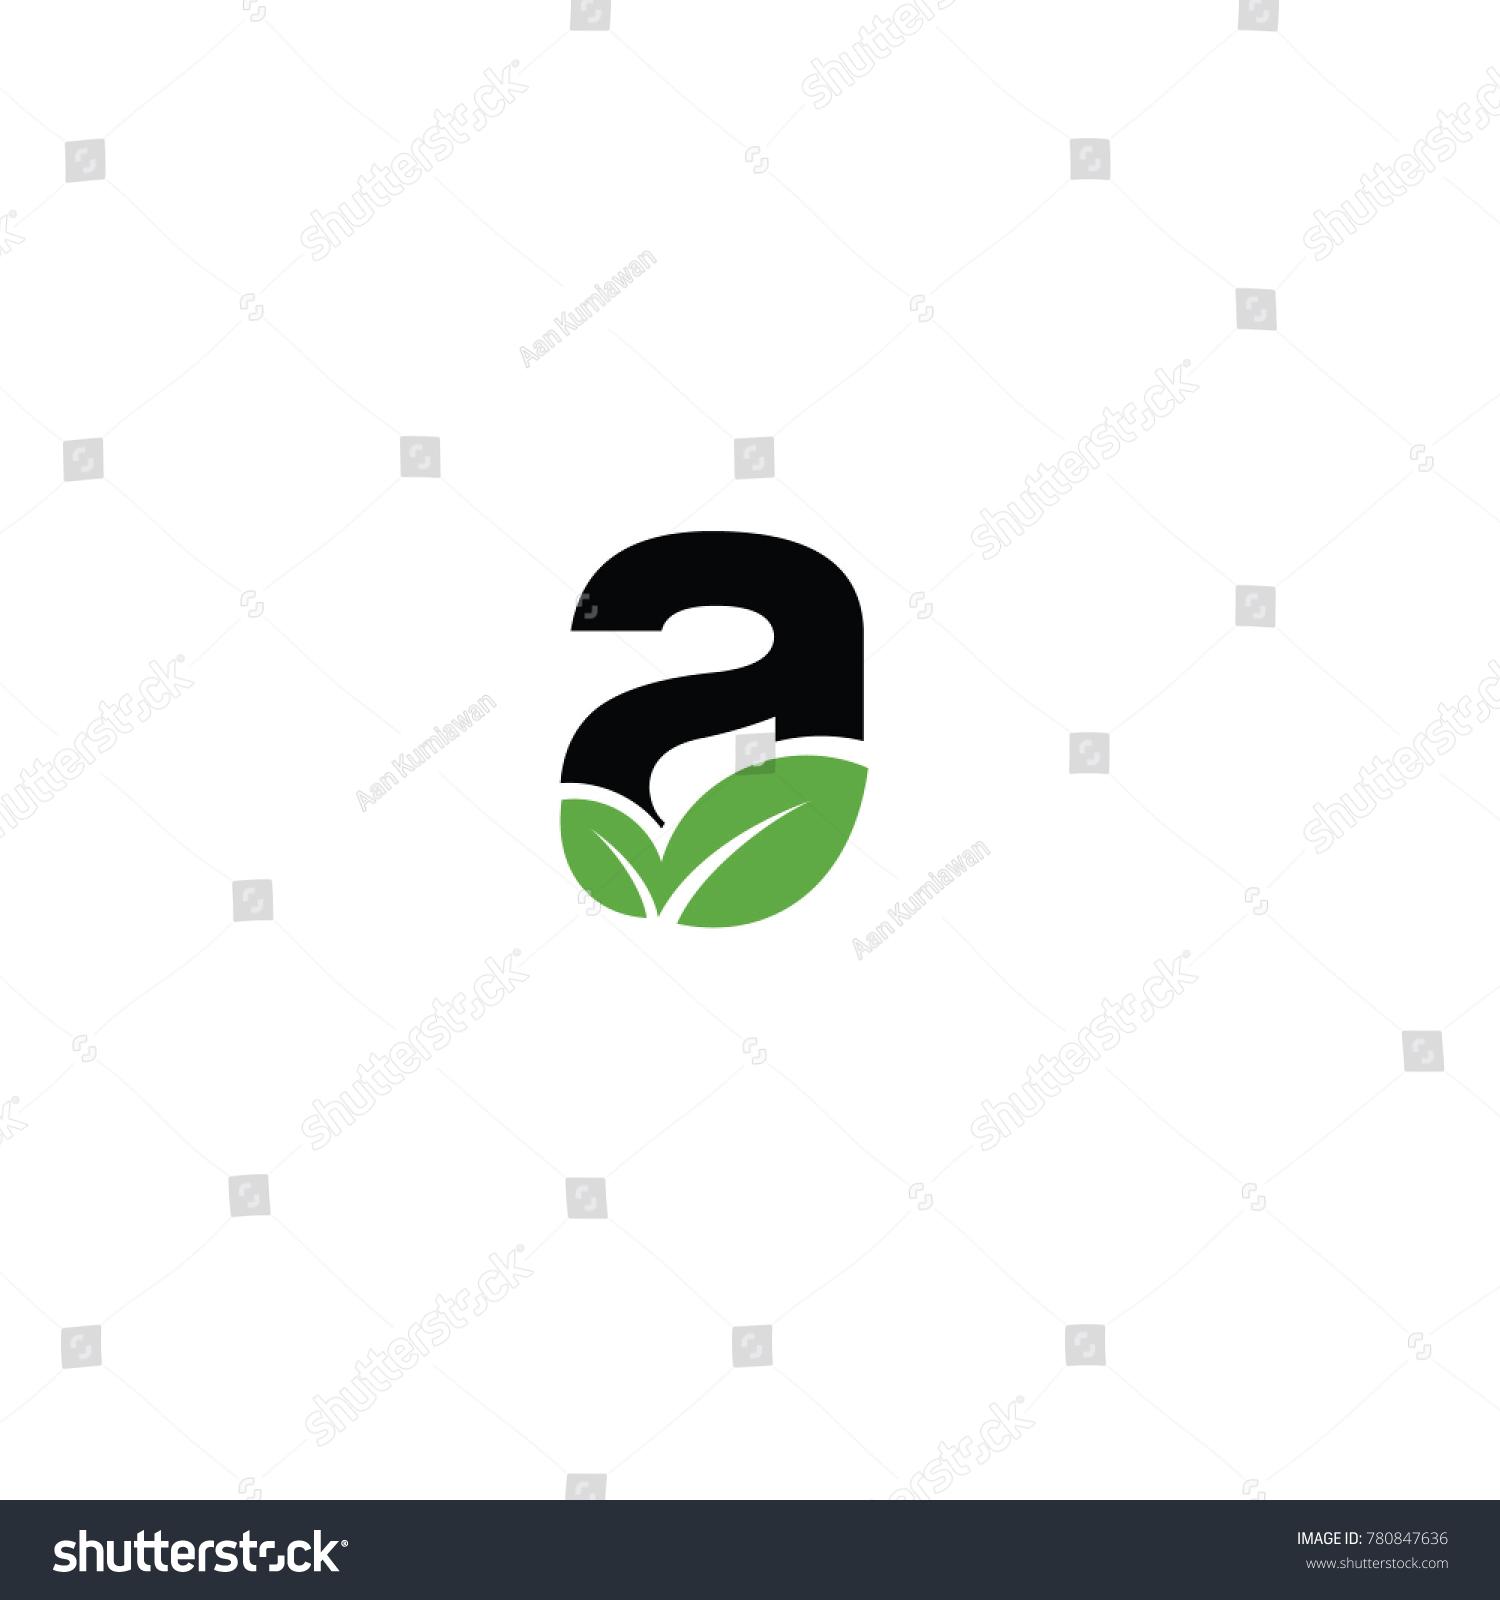 Font logo leaf vector logo template stock vector 780847636 a font logo leaf vector logo template biocorpaavc Gallery